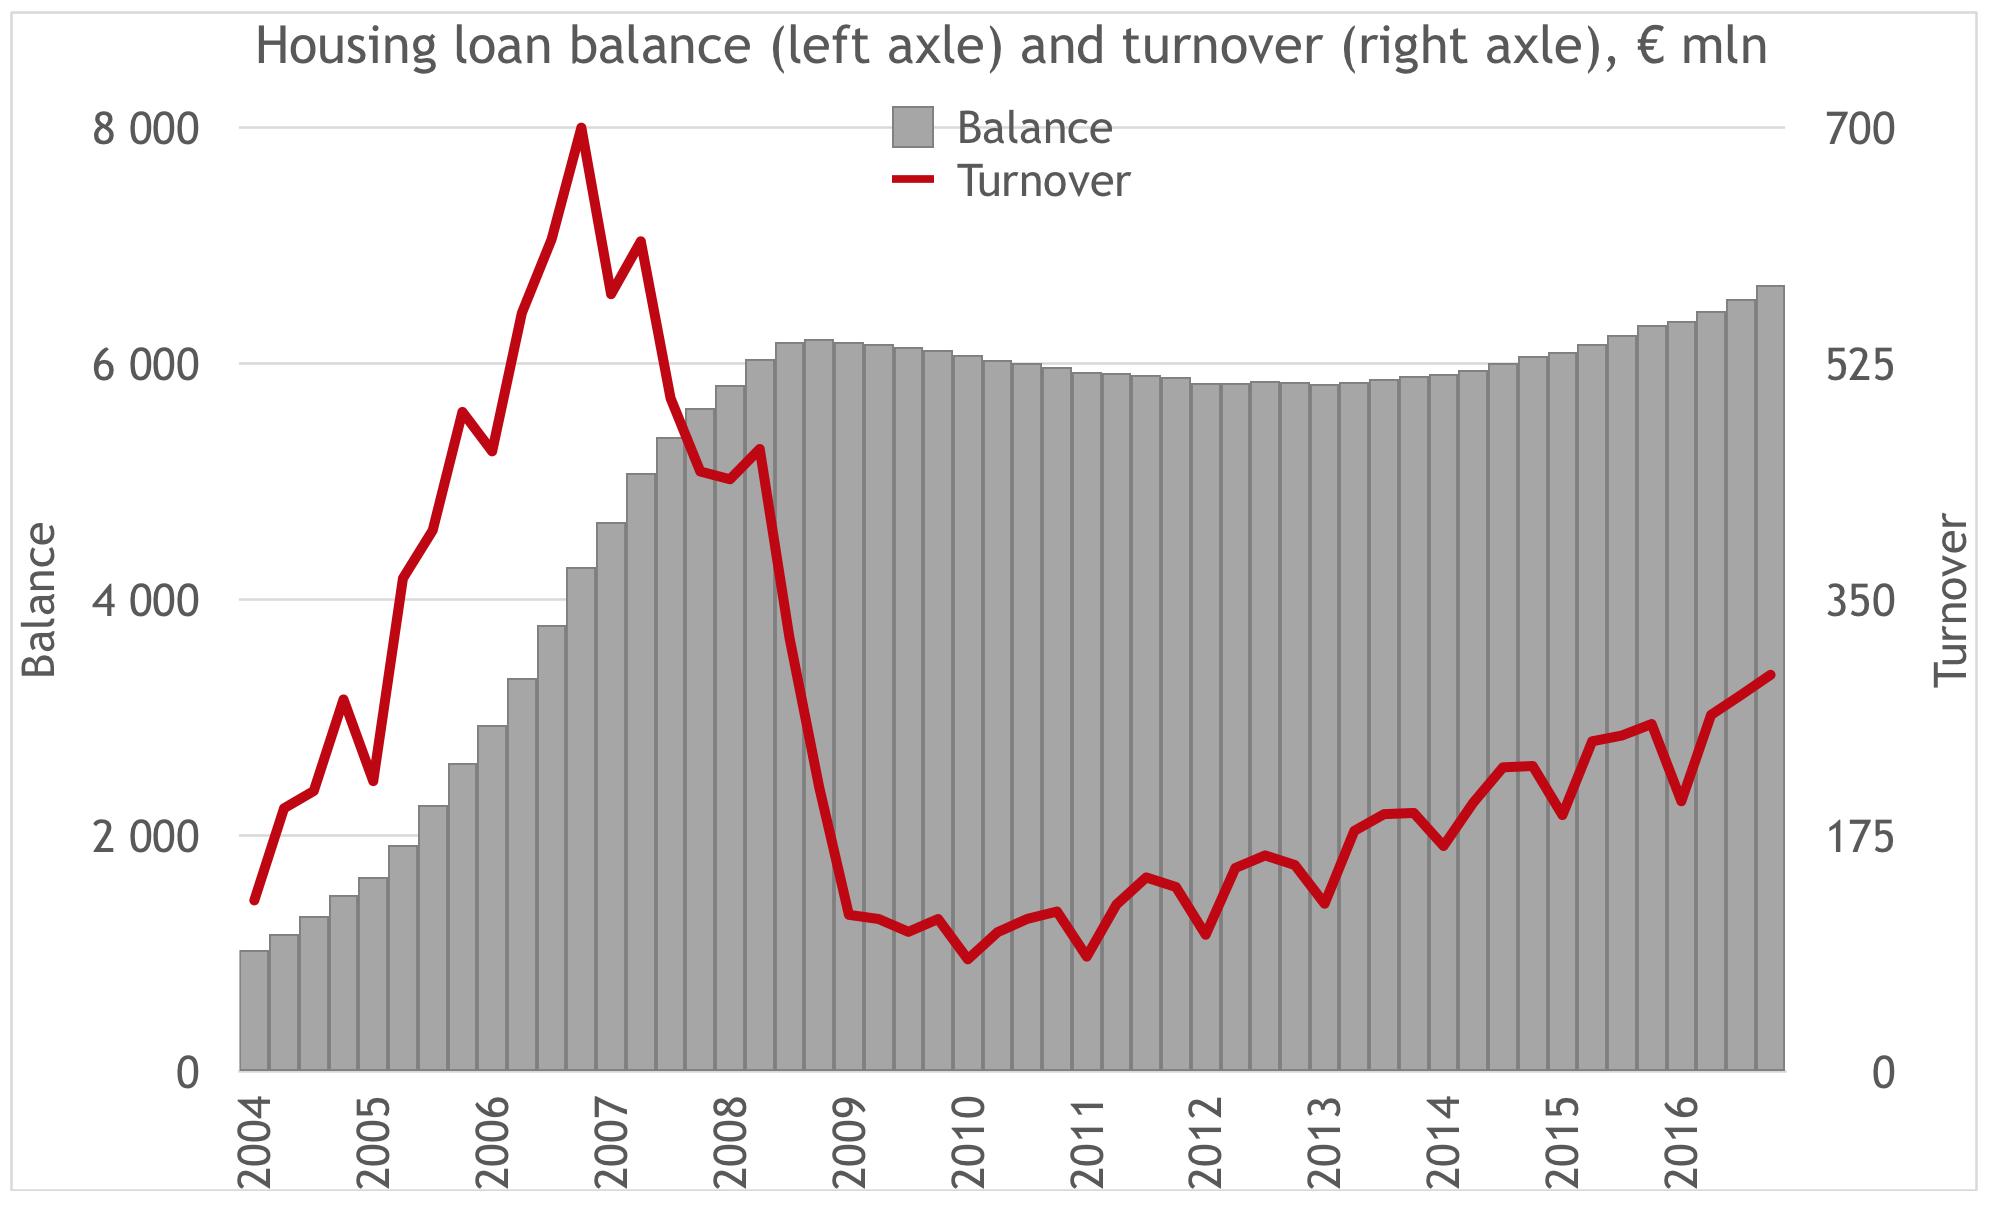 Estonian housing loan balance and turnover 2017